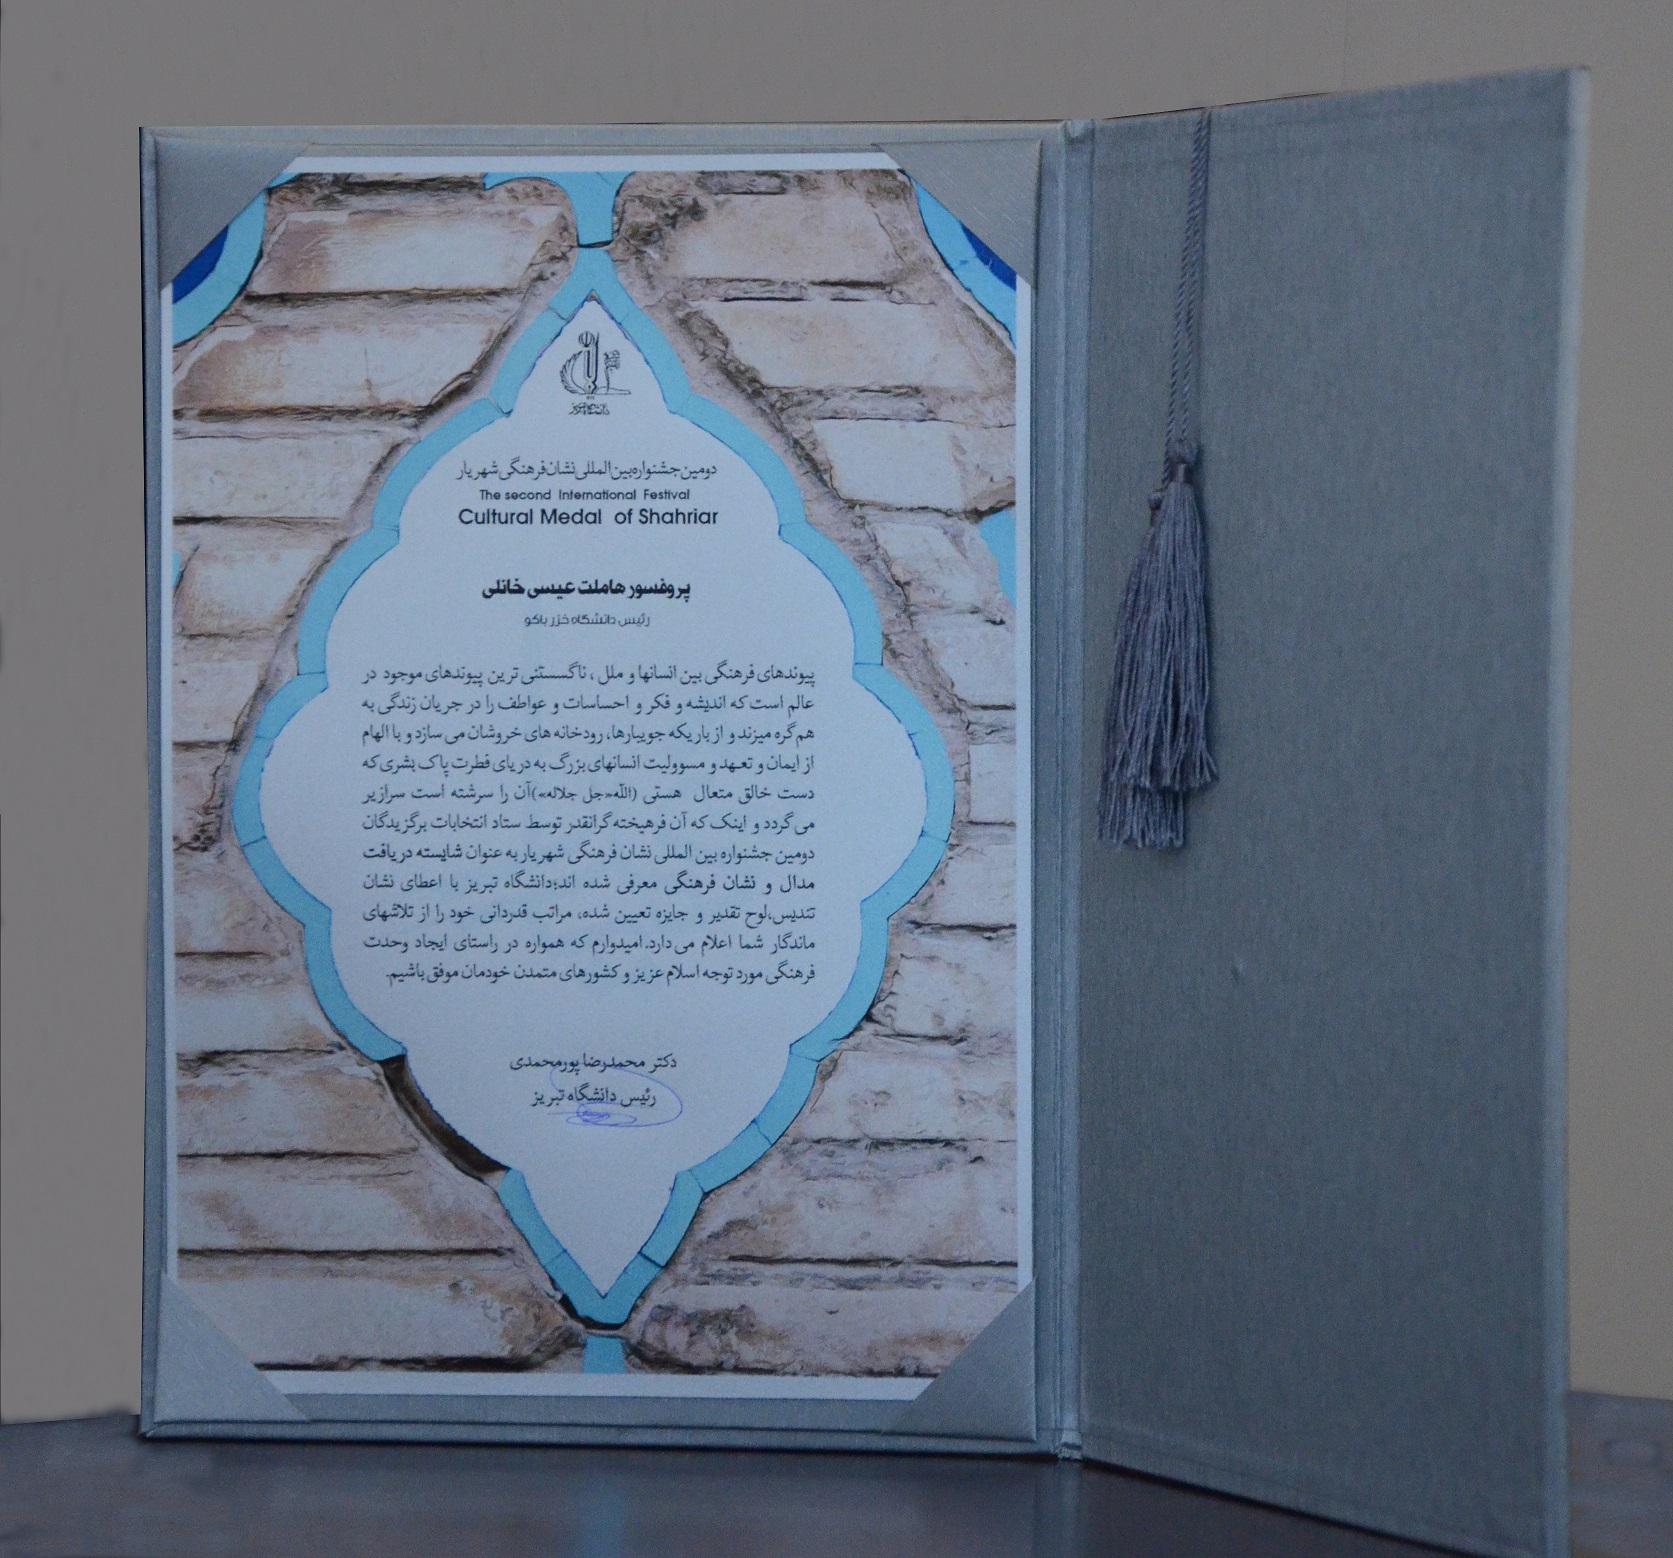 Founder Receives Shahriyar Medal